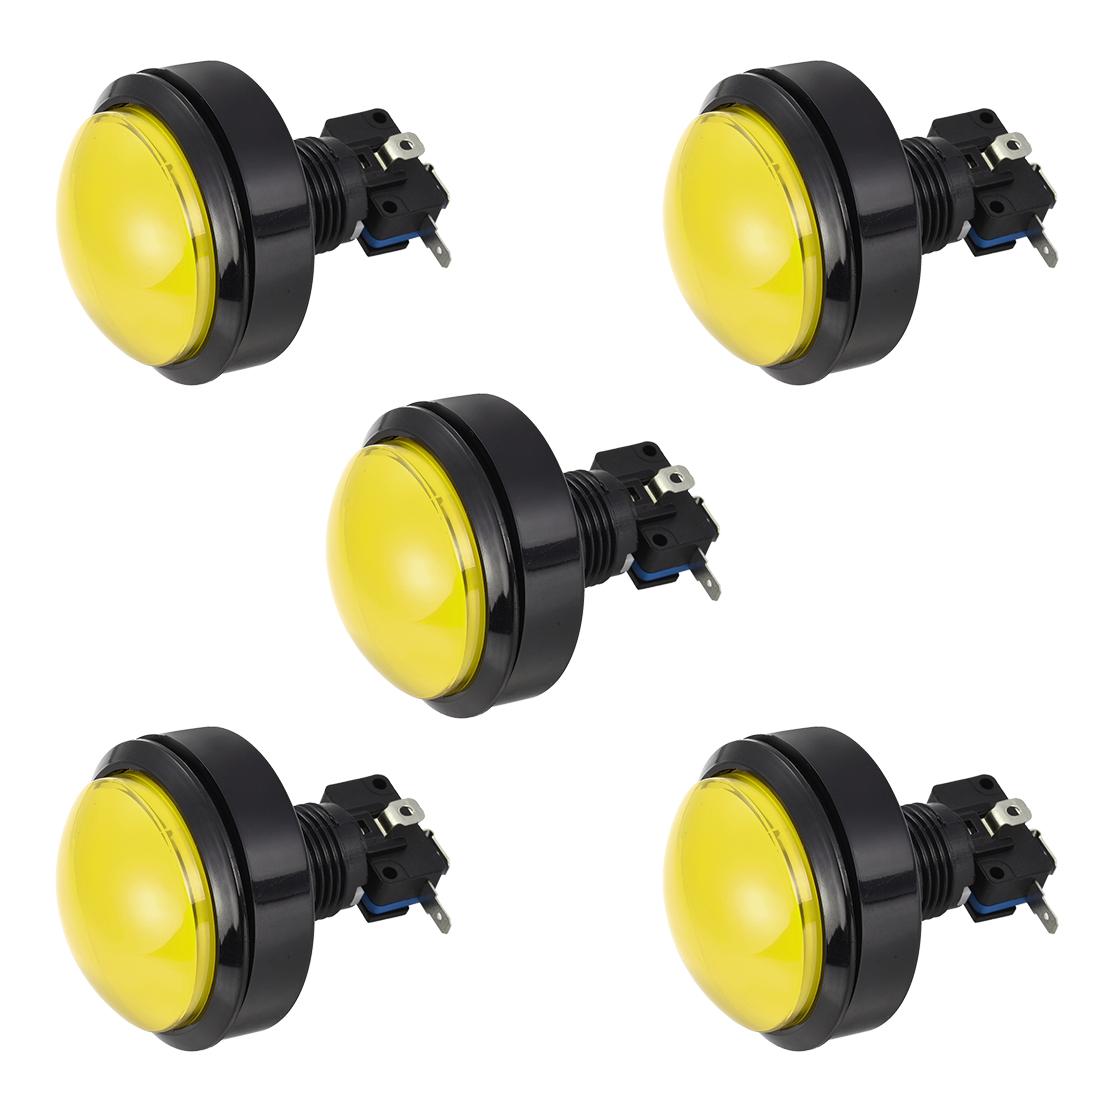 Game Push Button 62mm Round 12V LED Illuminated Push Button Switch Yellow 5pcs